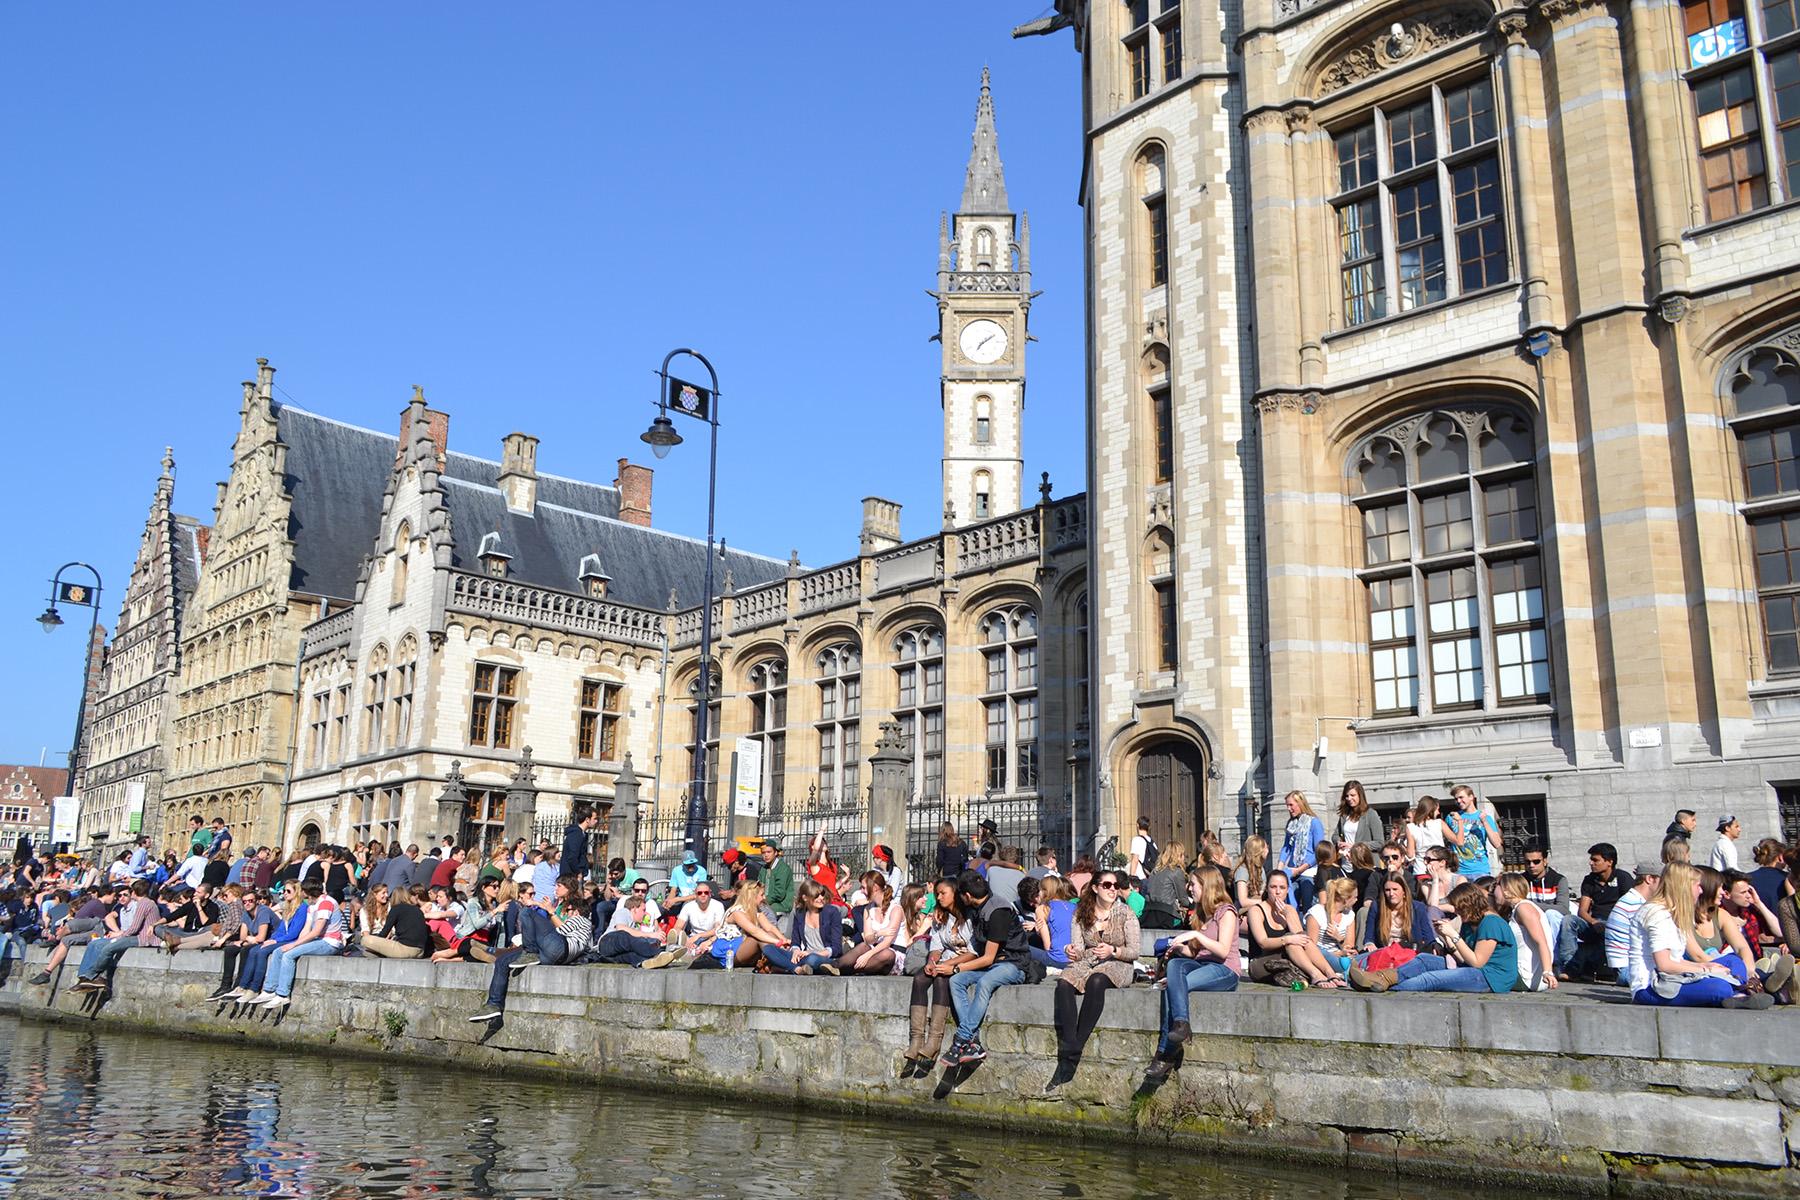 University students in Ghent, Belgium